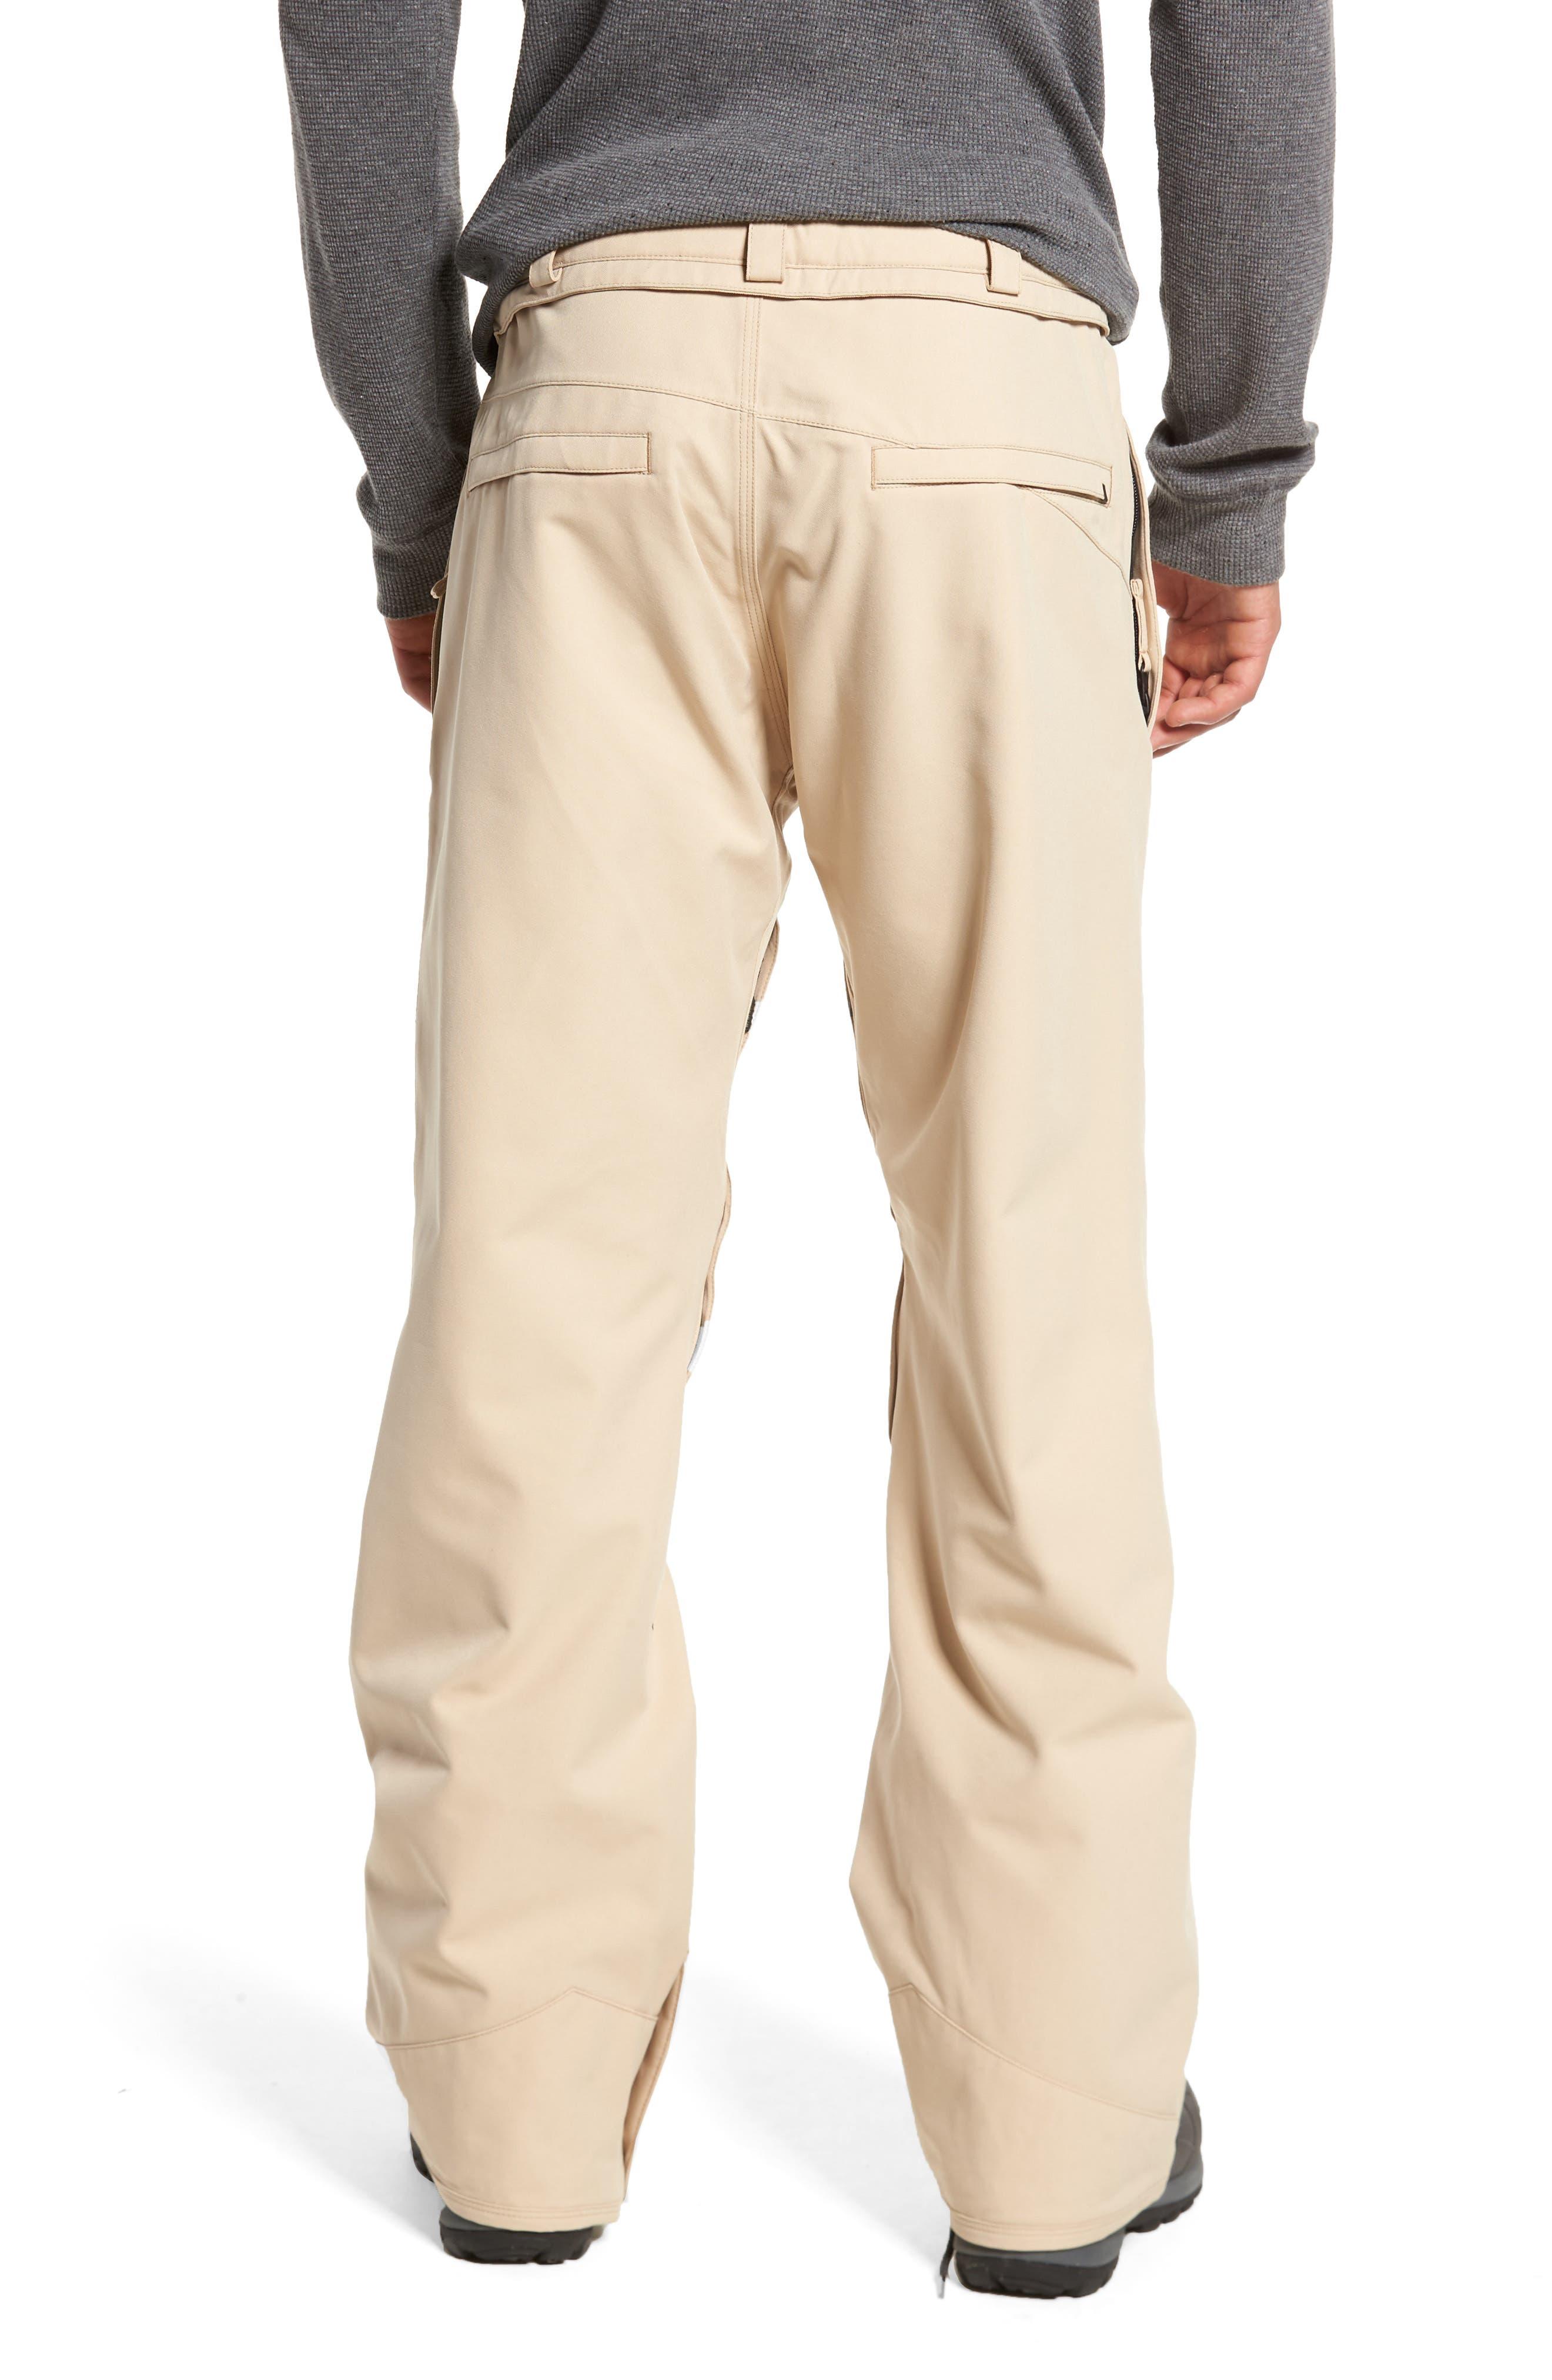 Weatherproof Snow Chino Pants,                             Alternate thumbnail 2, color,                             Khaki